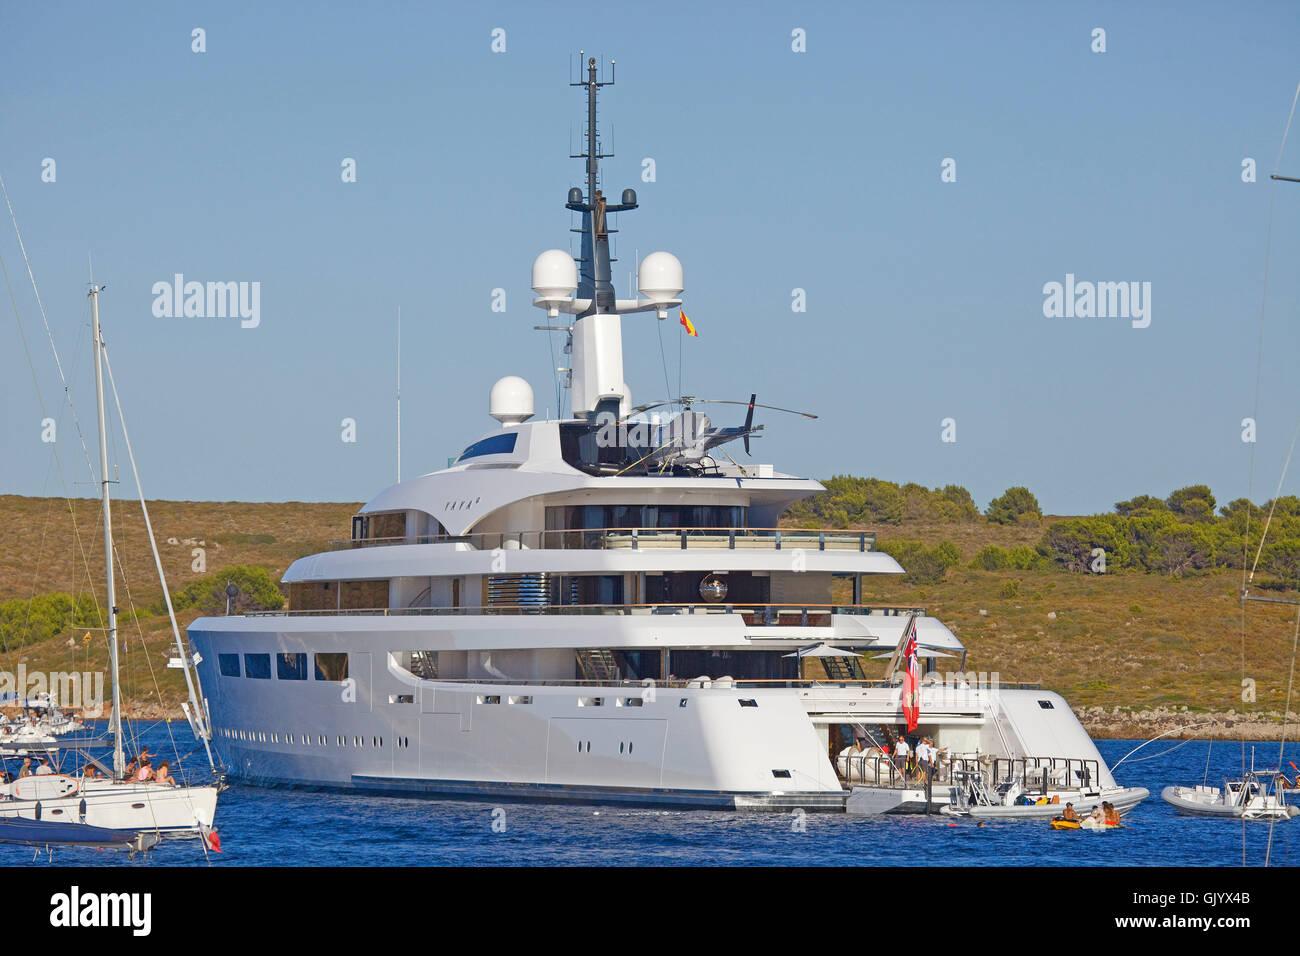 Vava 11 100m Superyacht 314ft Vessel With A Fold Down Beach Club